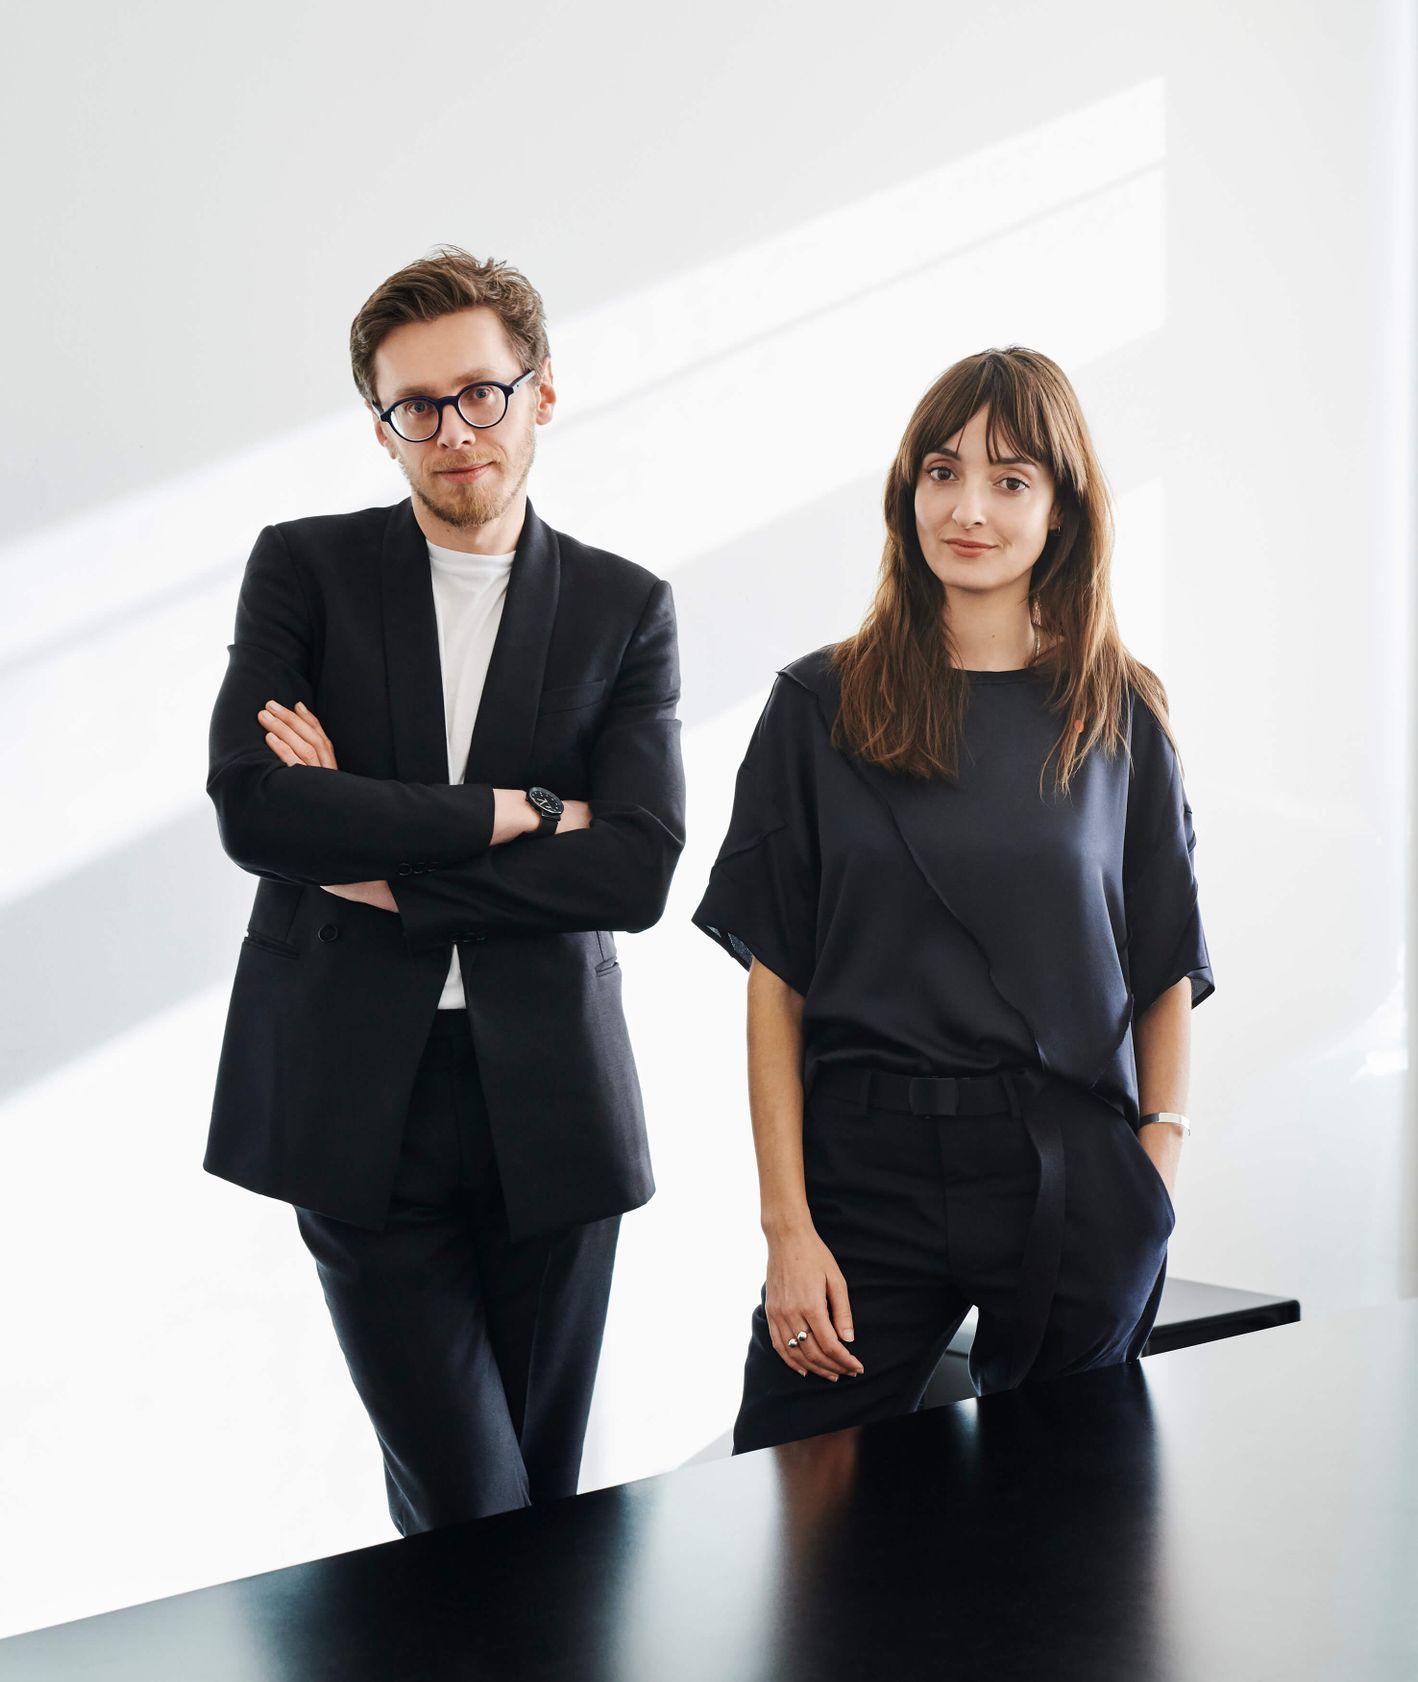 Portret projektantów Any Relavo i Gerhardta Kellermann